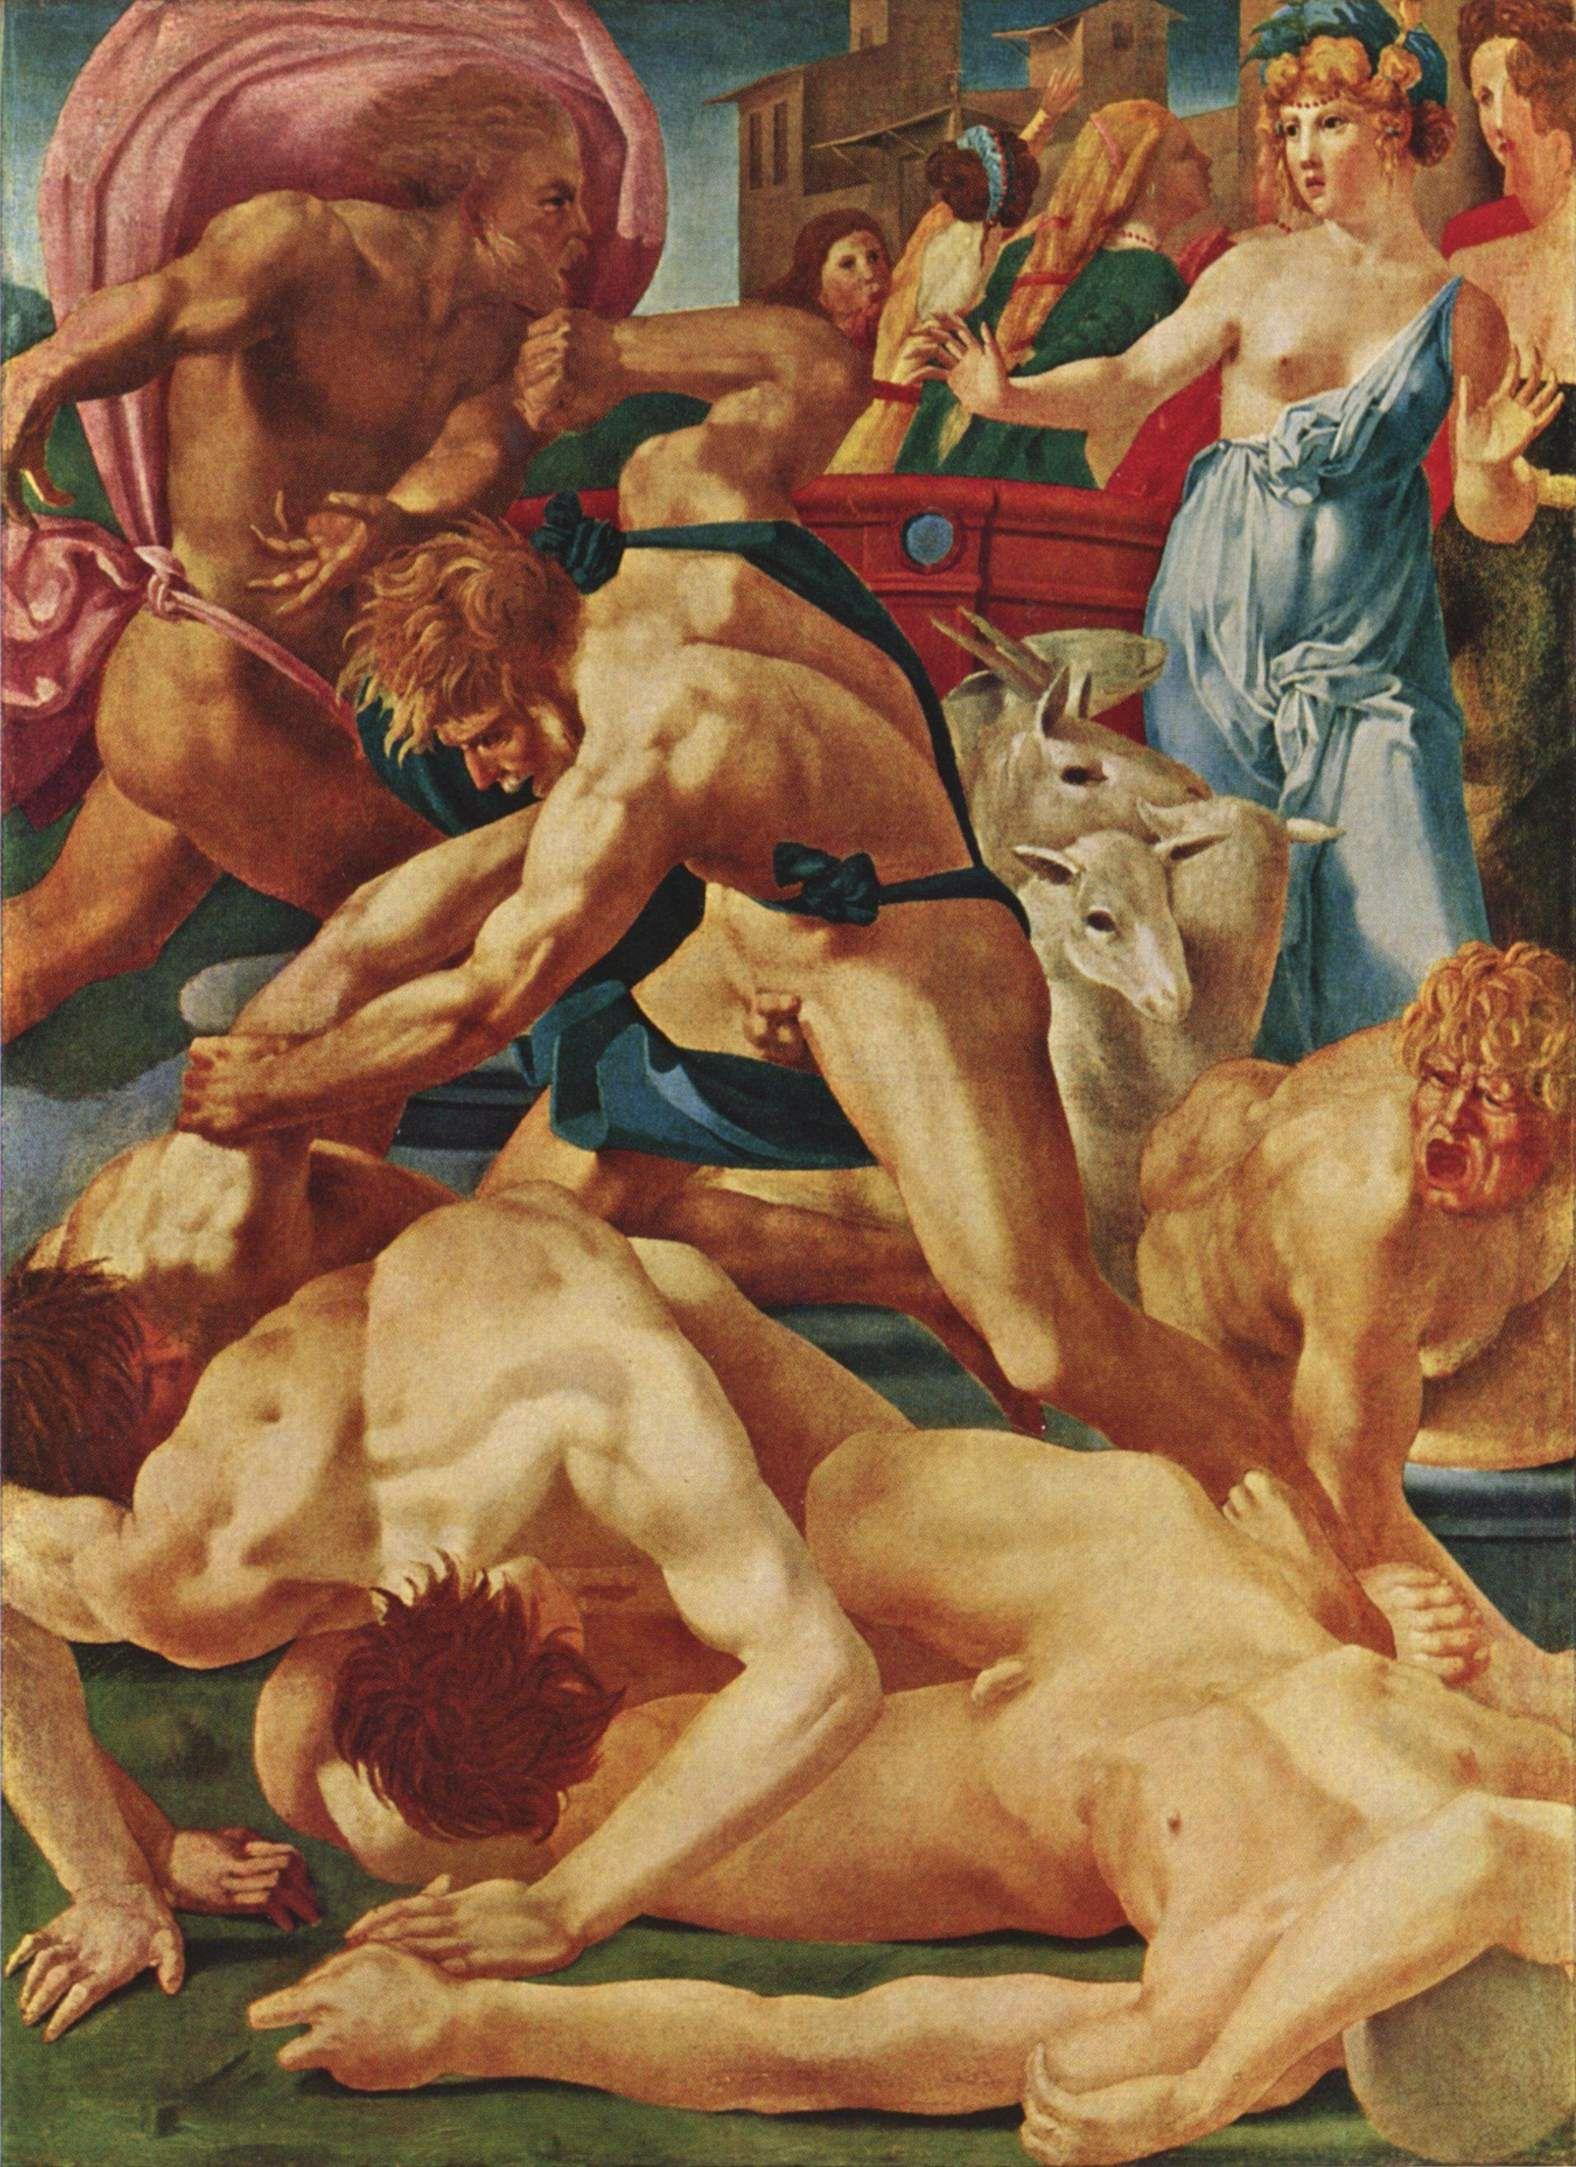 Rosso Fiorentino Renaissance Art Uffizi Gallery Renaissance